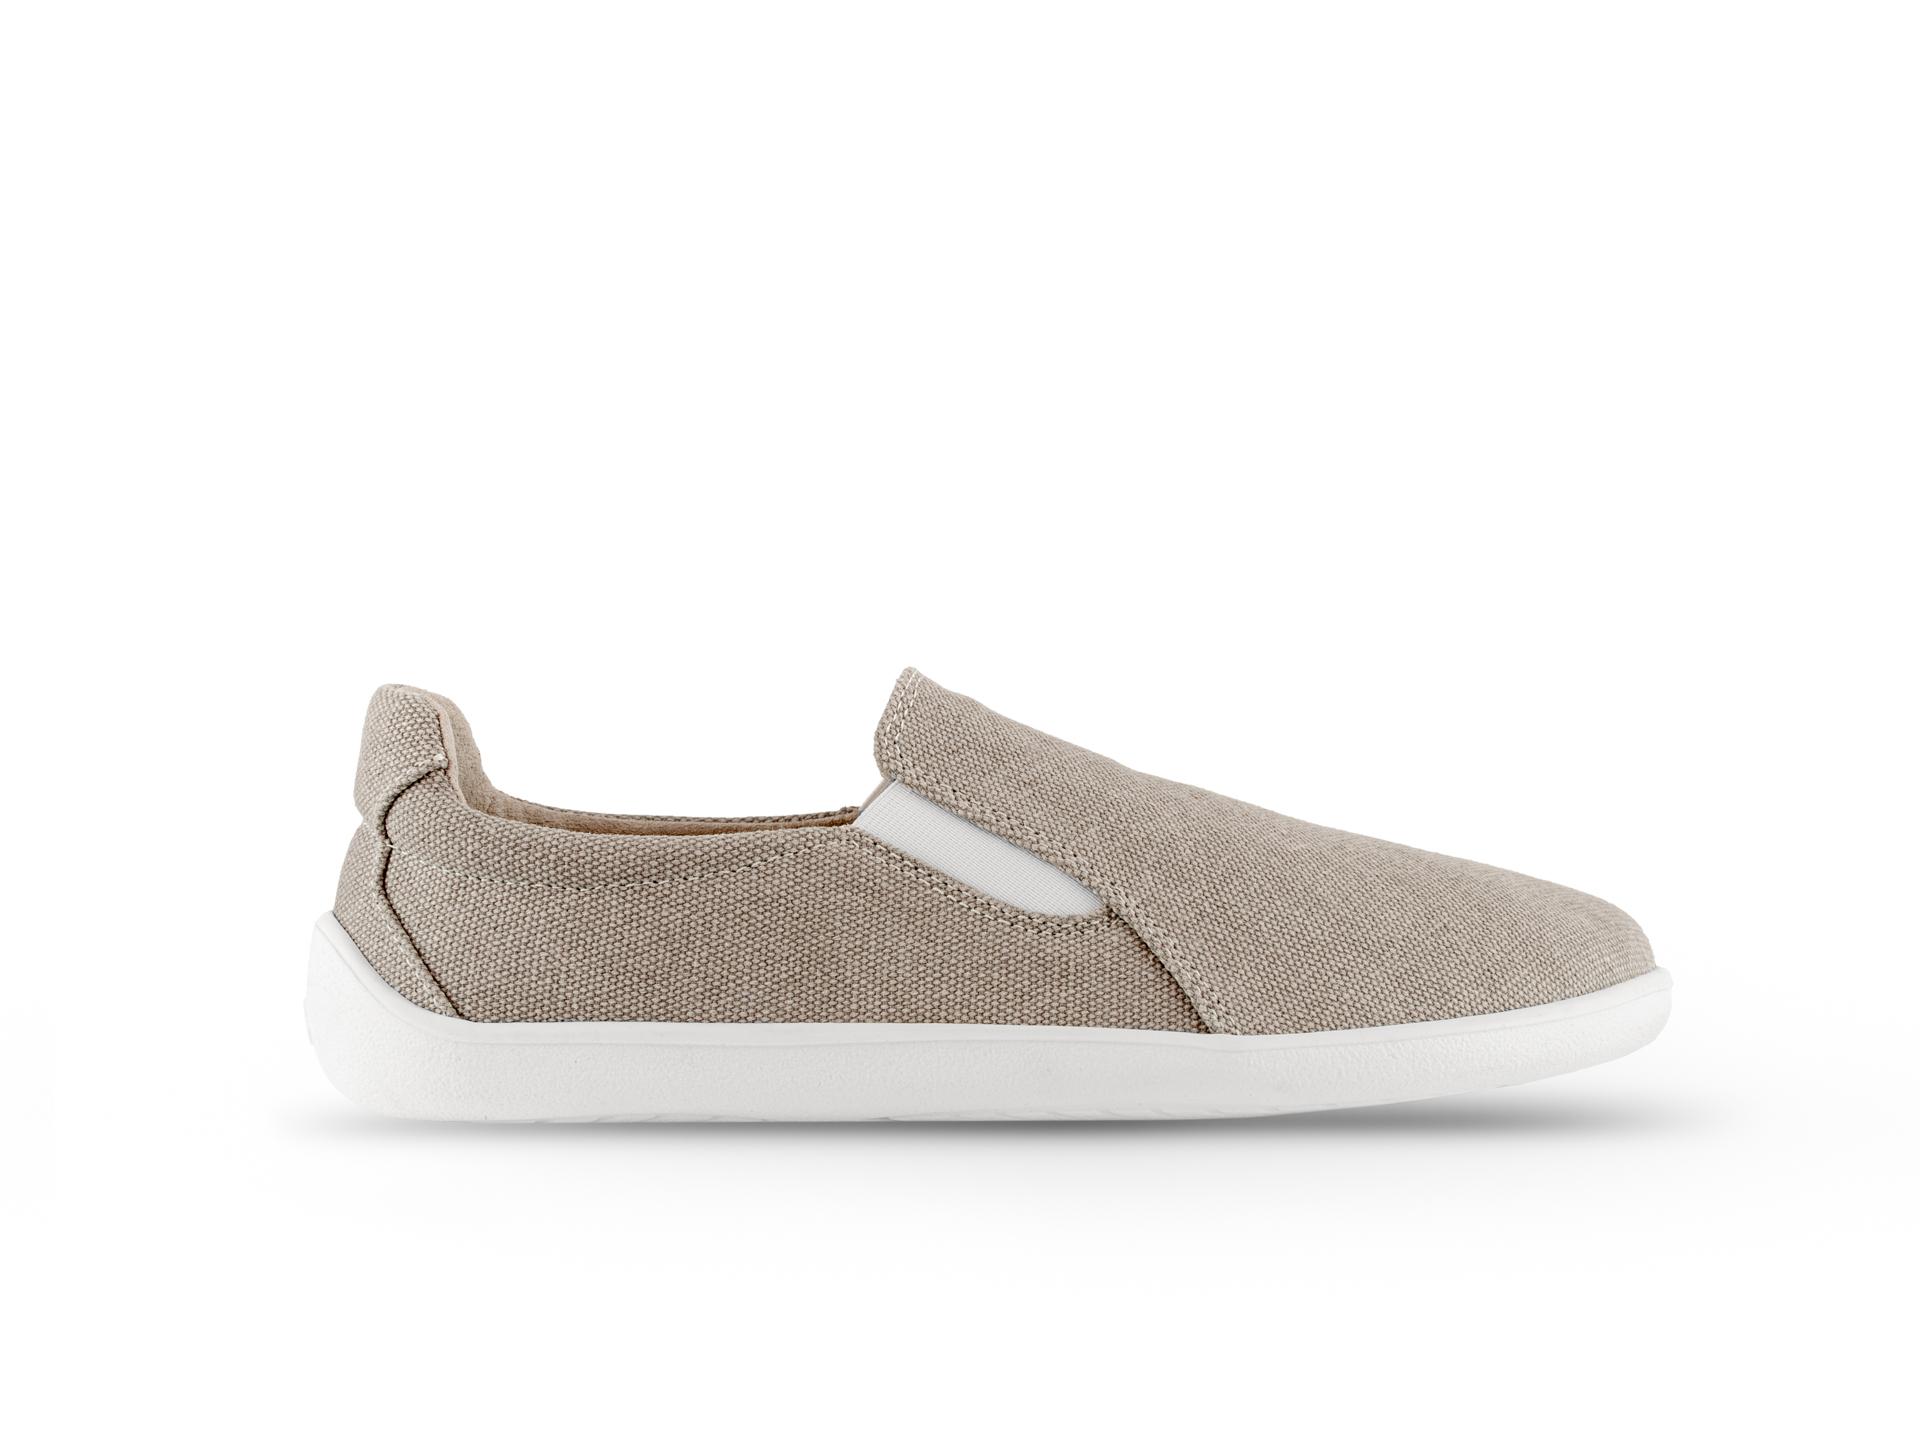 Barefoot Be Lenka Eazy - Sand 40